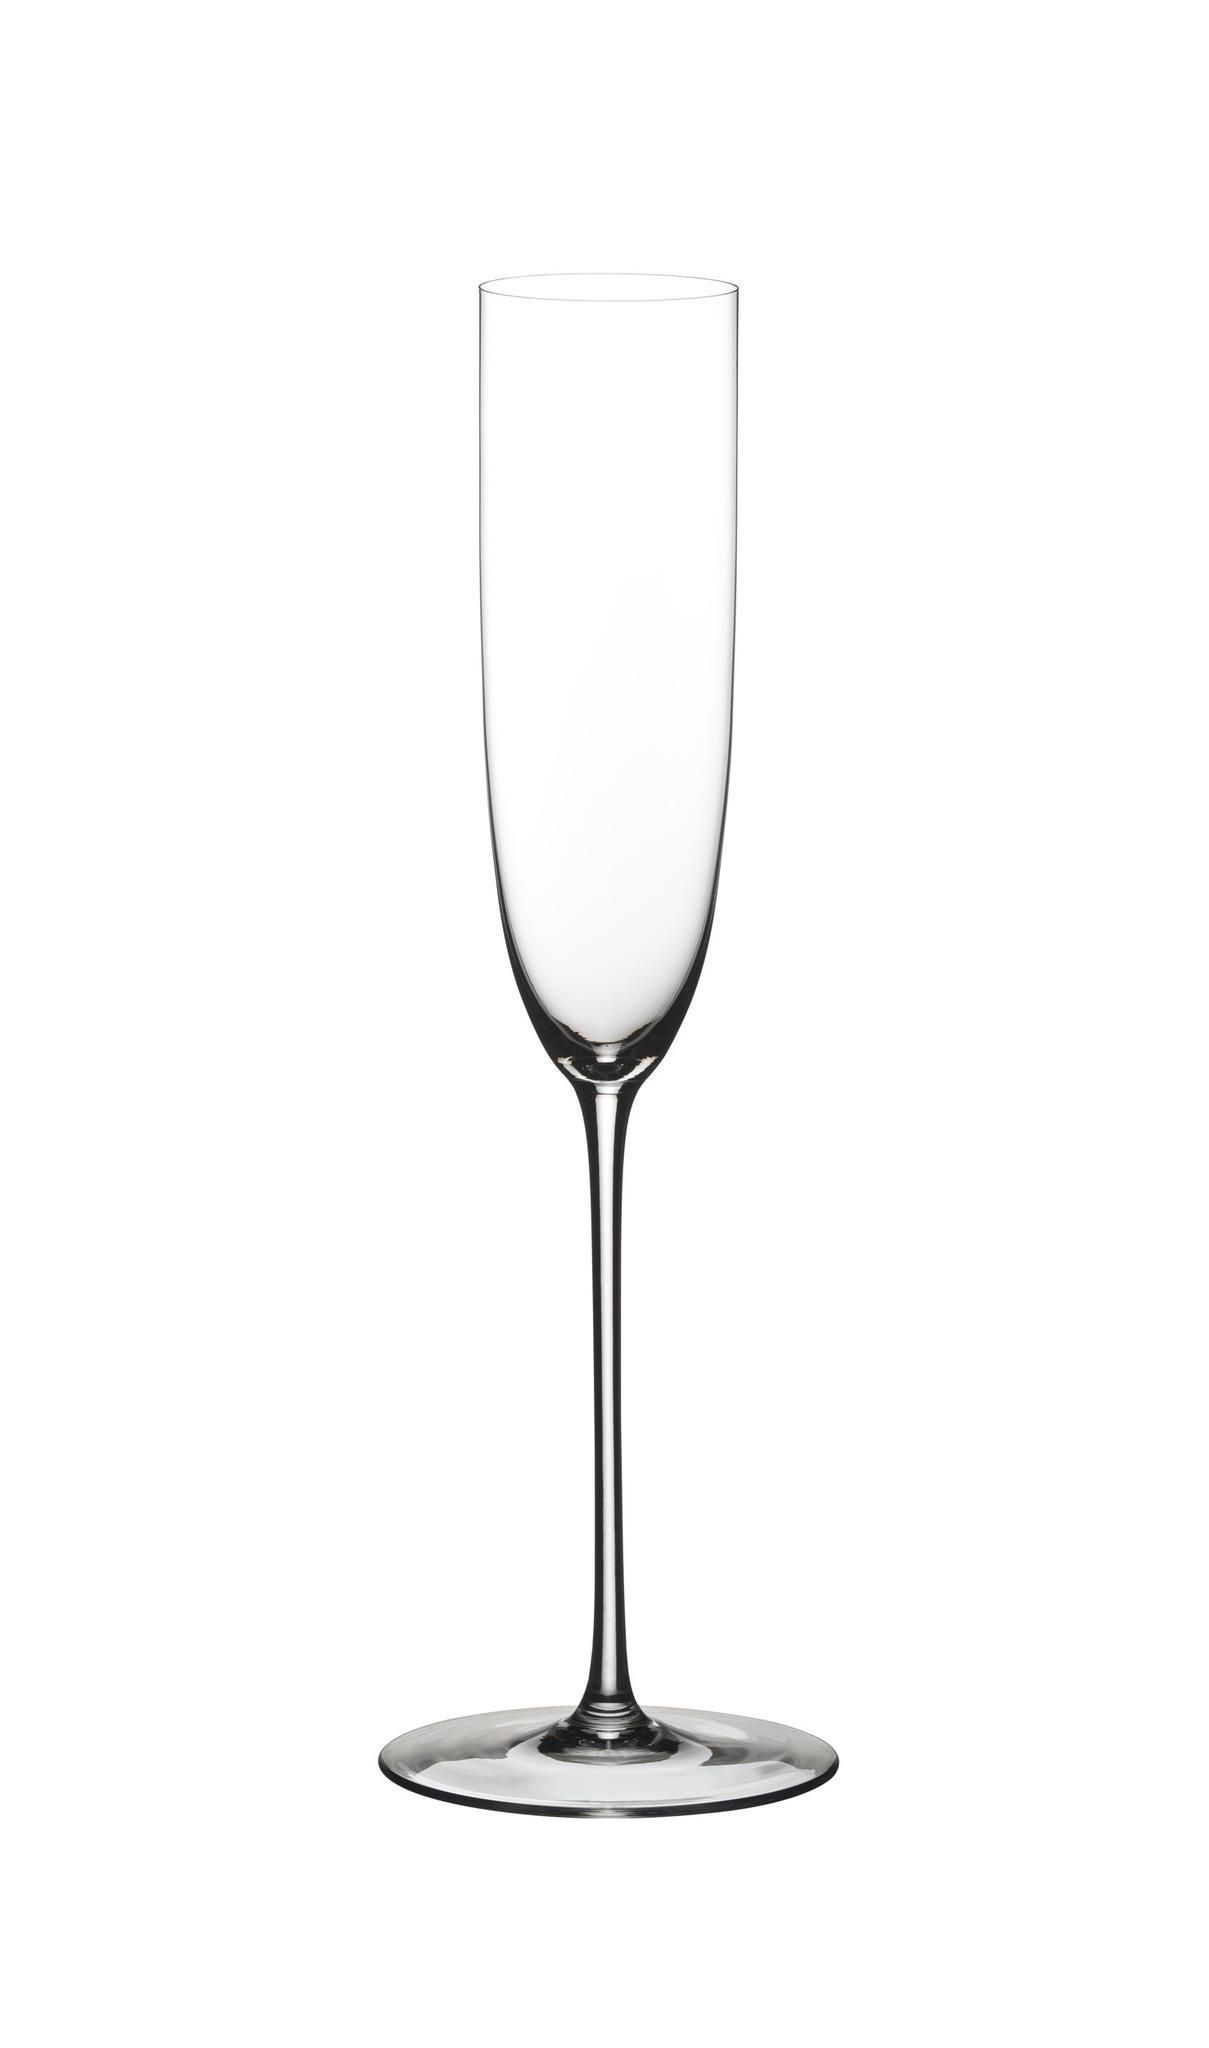 Бокал для шампанского Riedel Champagne Flute, Riedel Superleggero, 186 мл